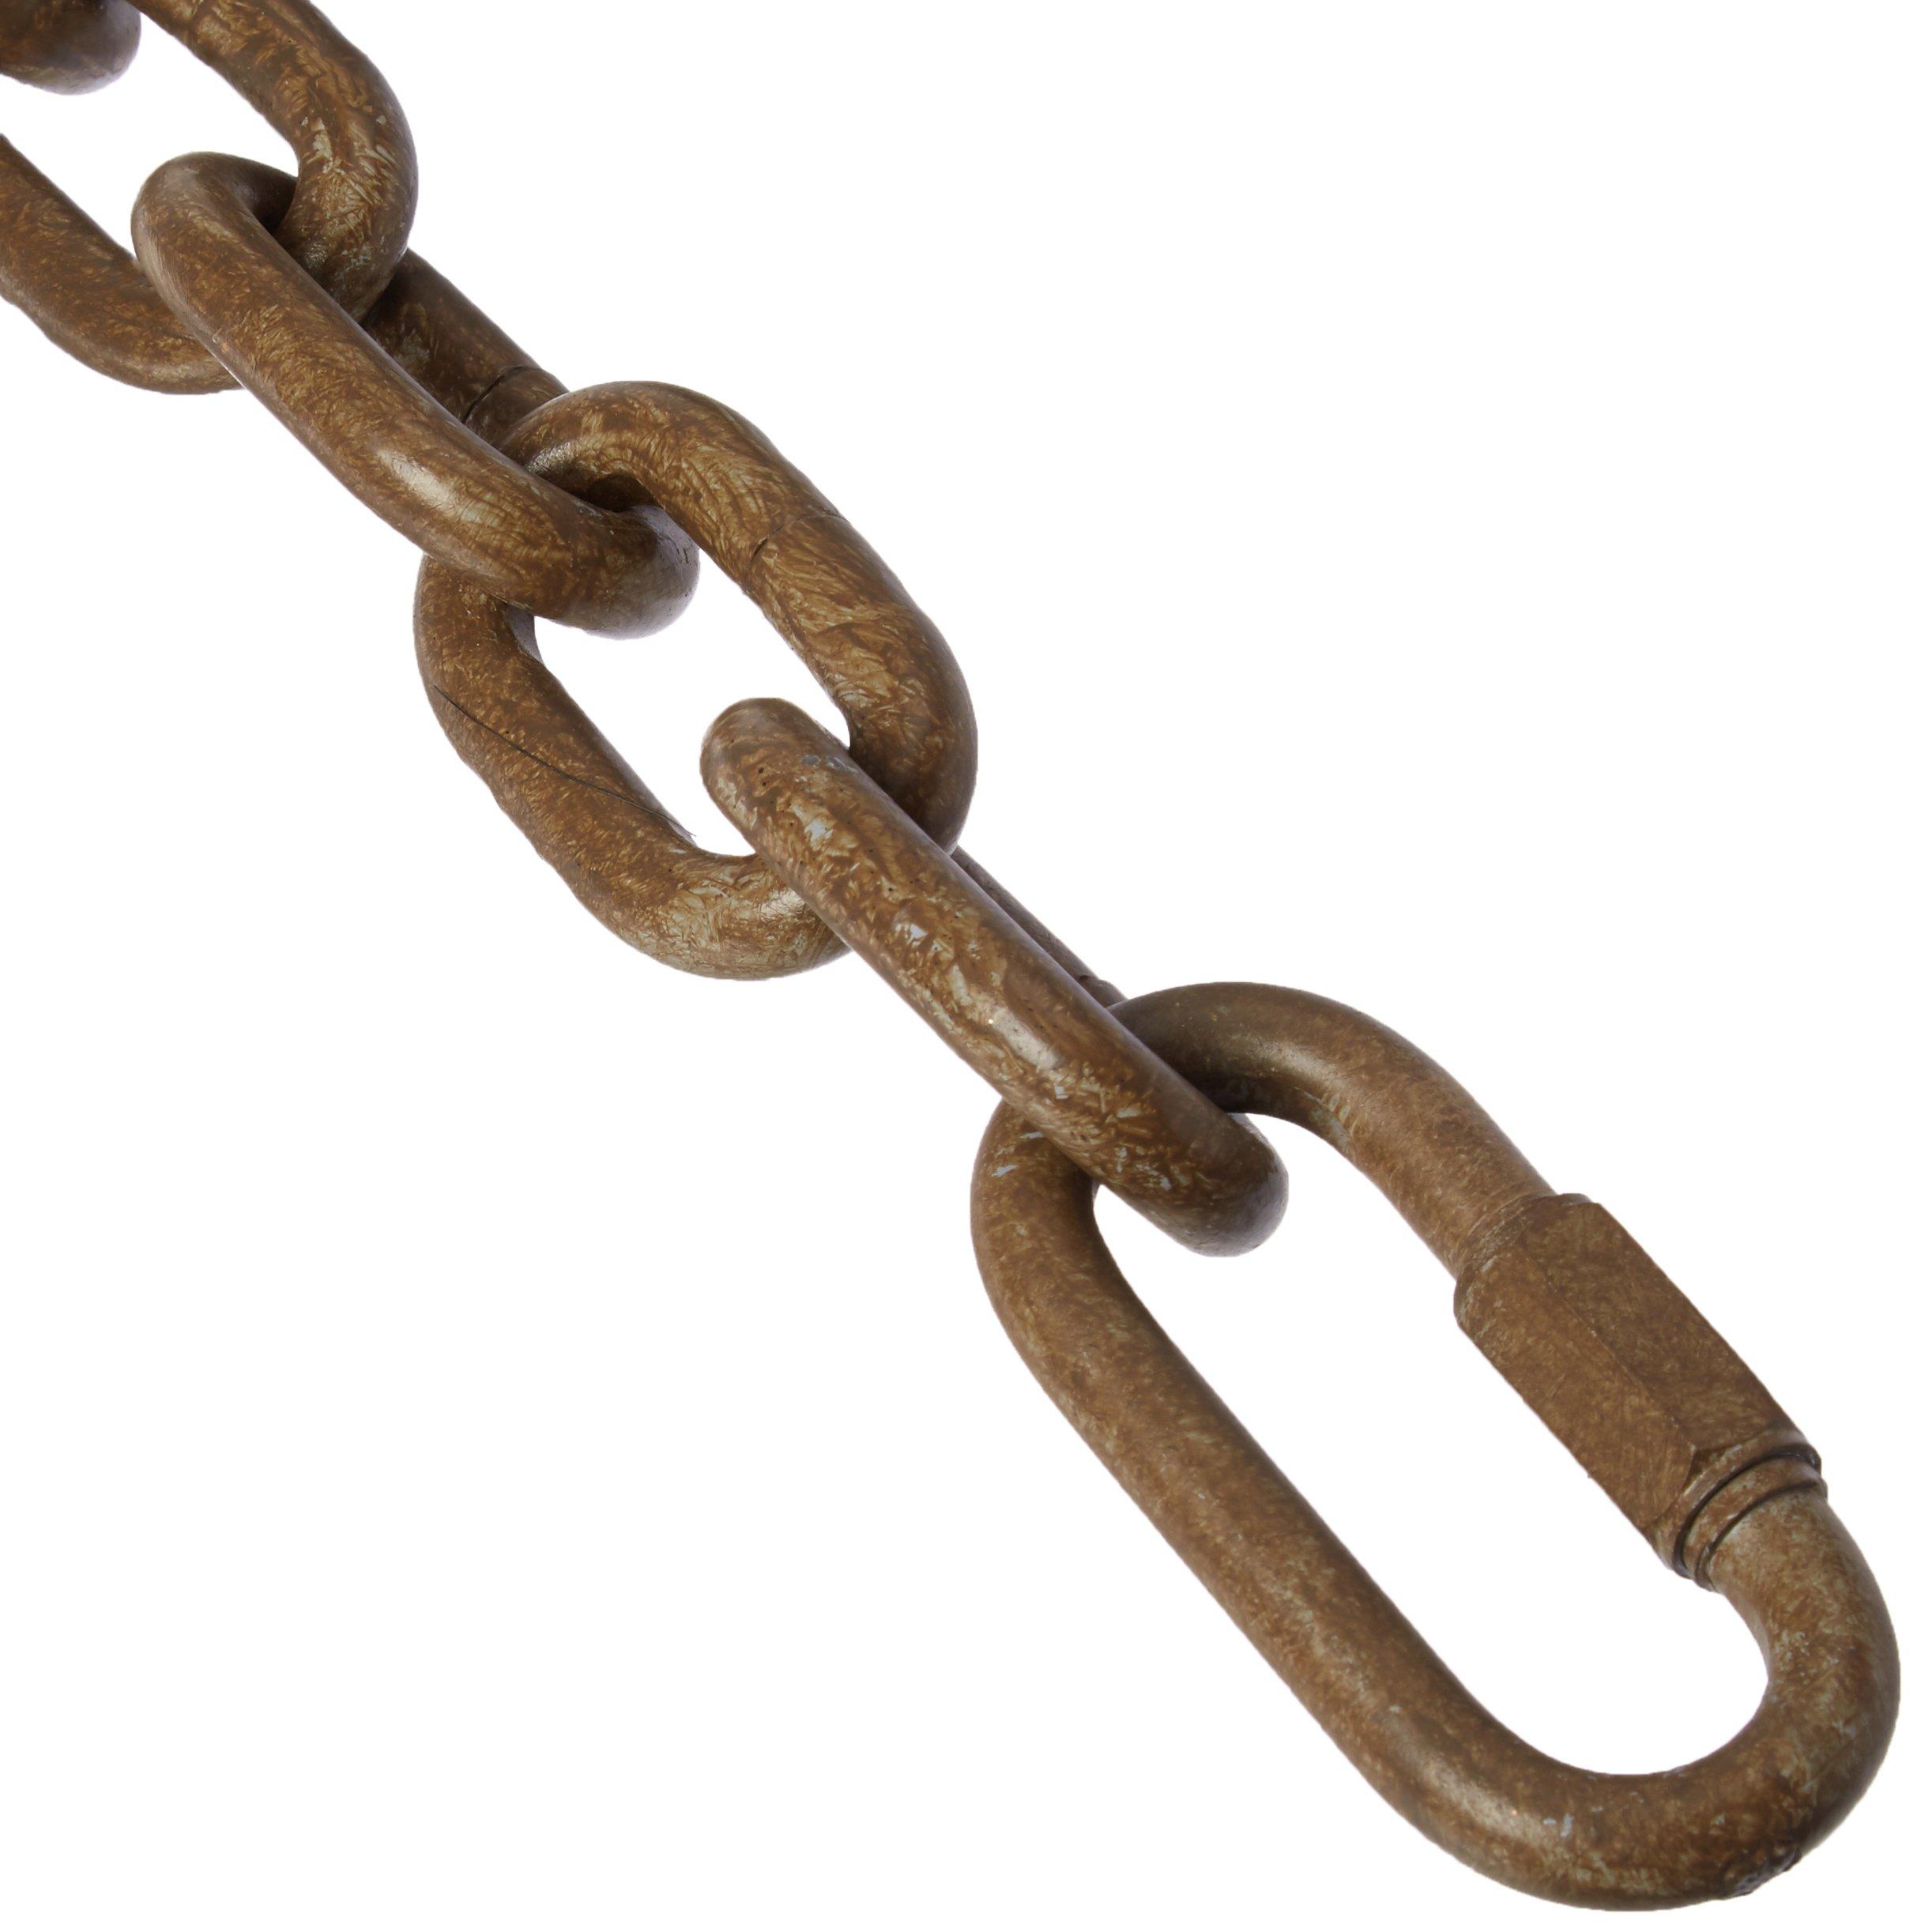 Kichler 4912RVN Accessory Decorative Chain 36-Inch, Ravenna